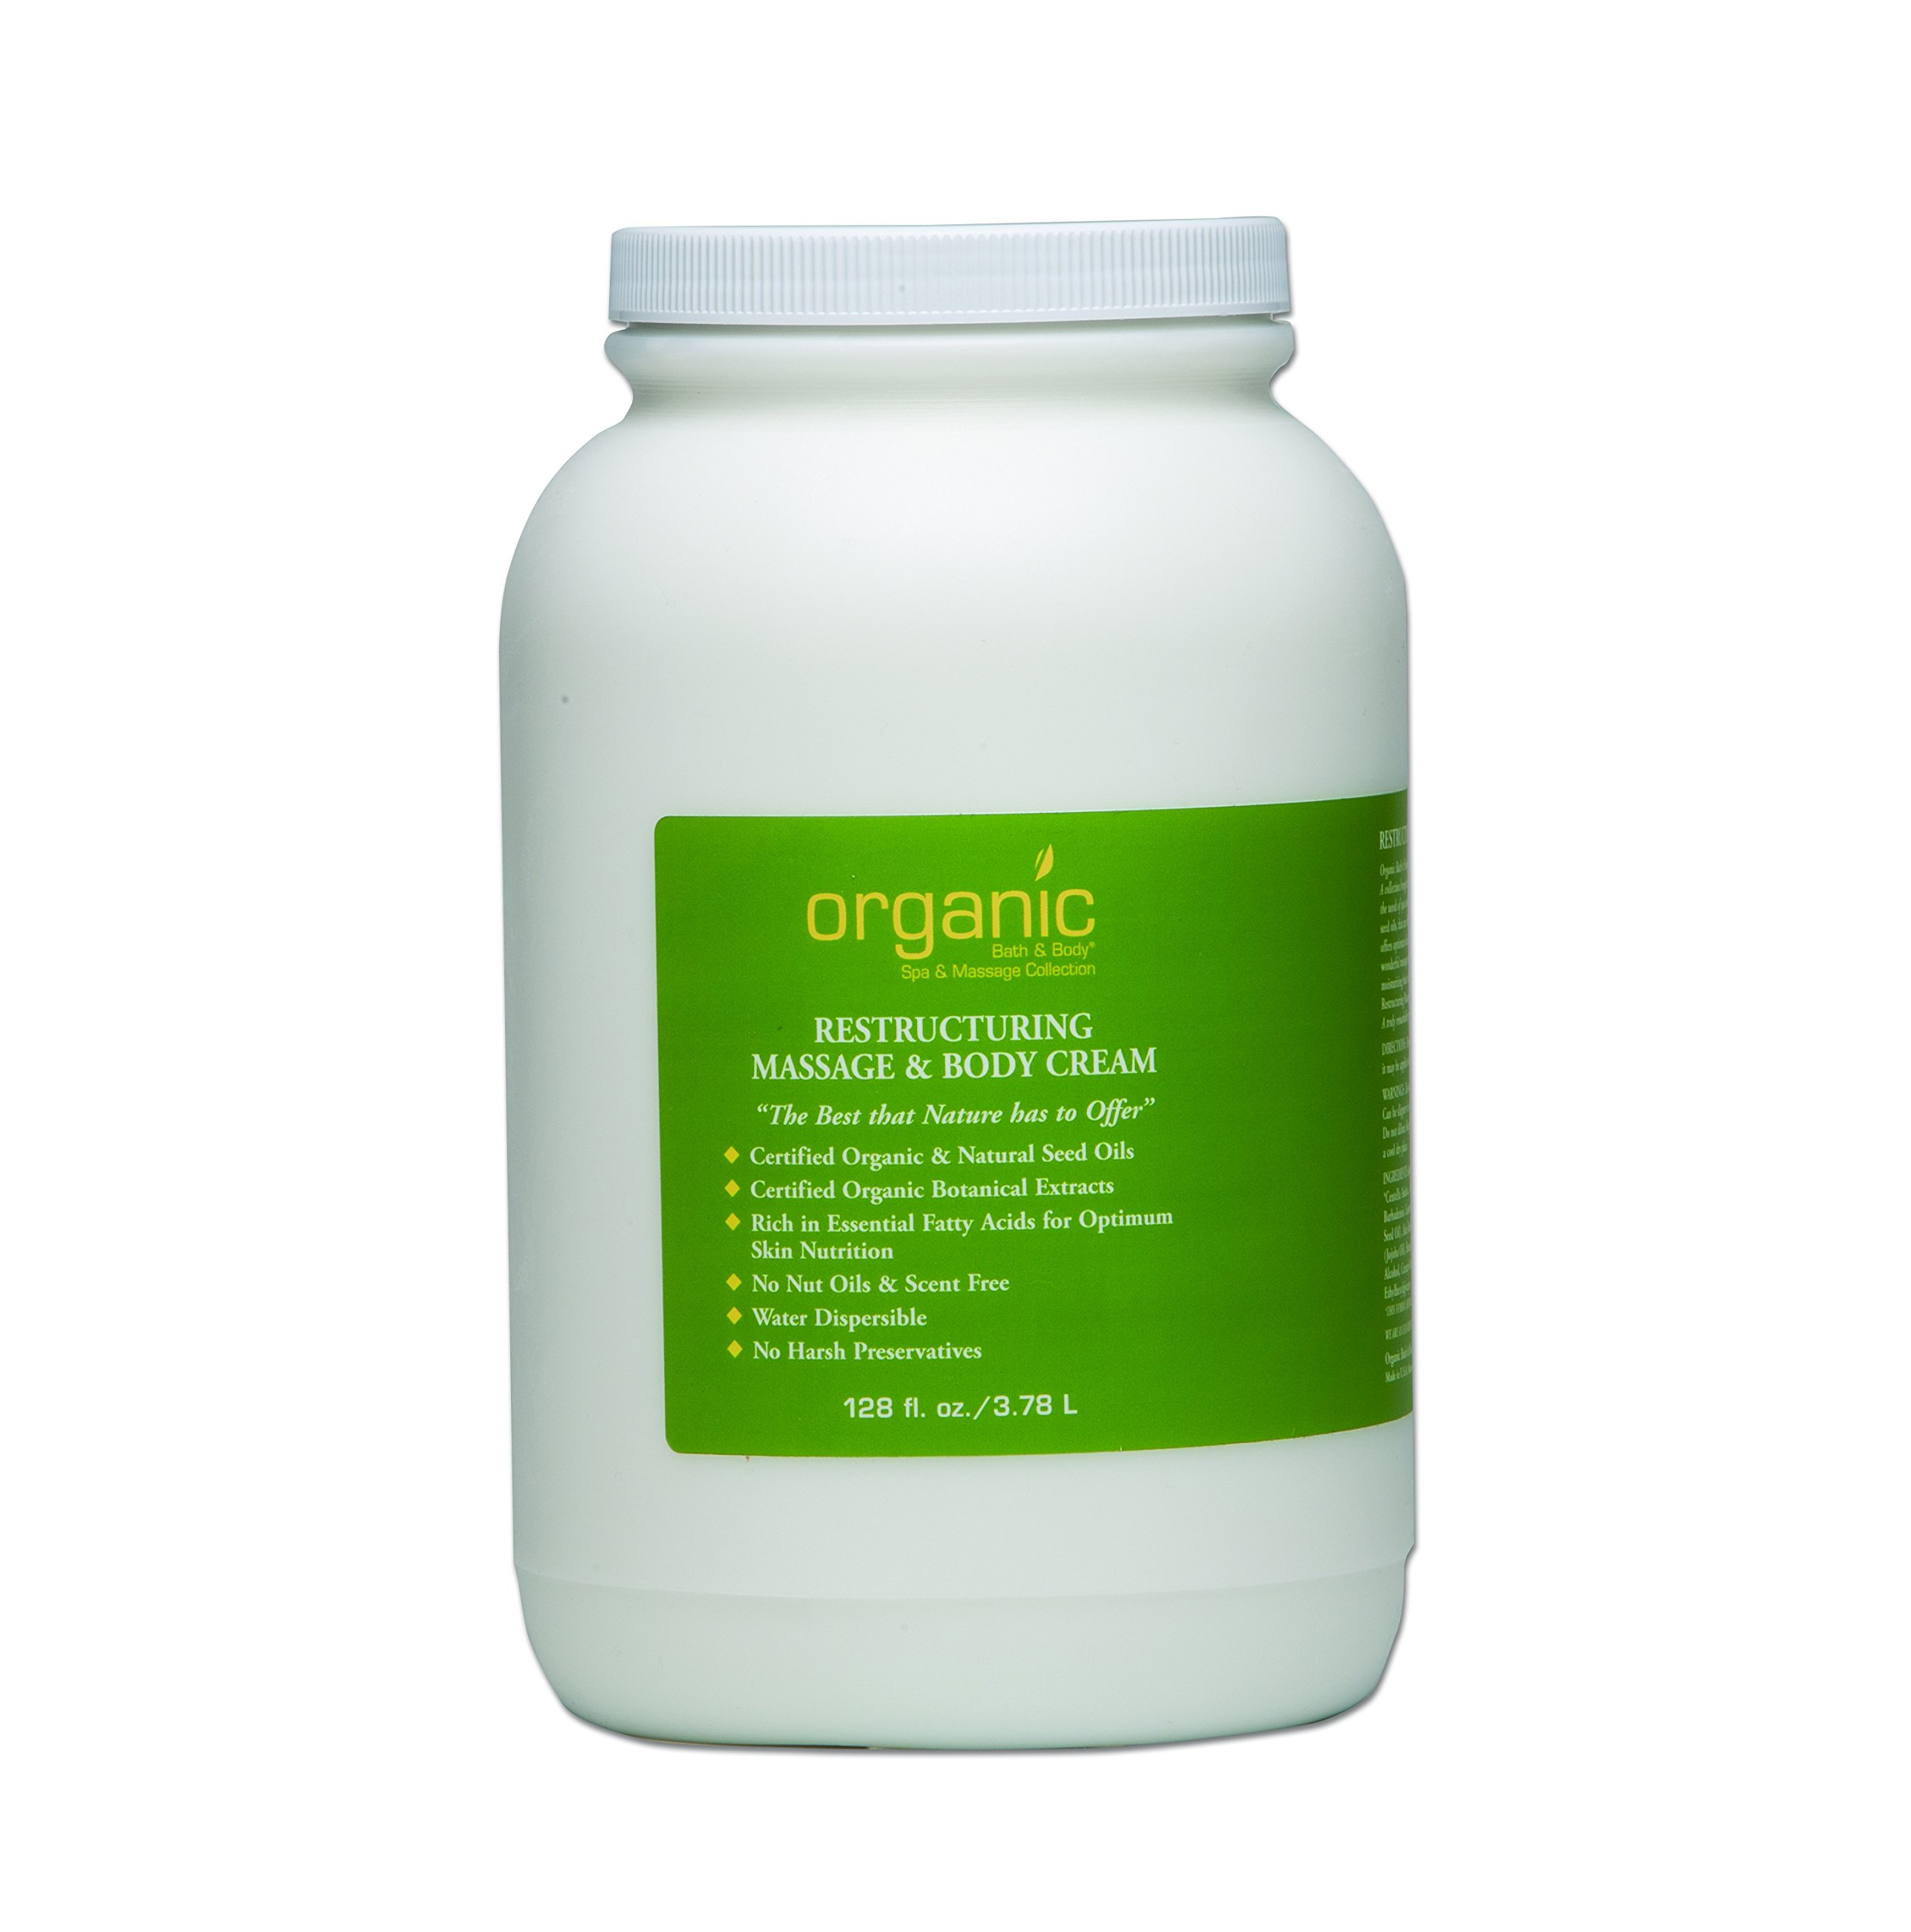 Restructuring Massage and Body Cream - 128 oz by Organic Bath & Body